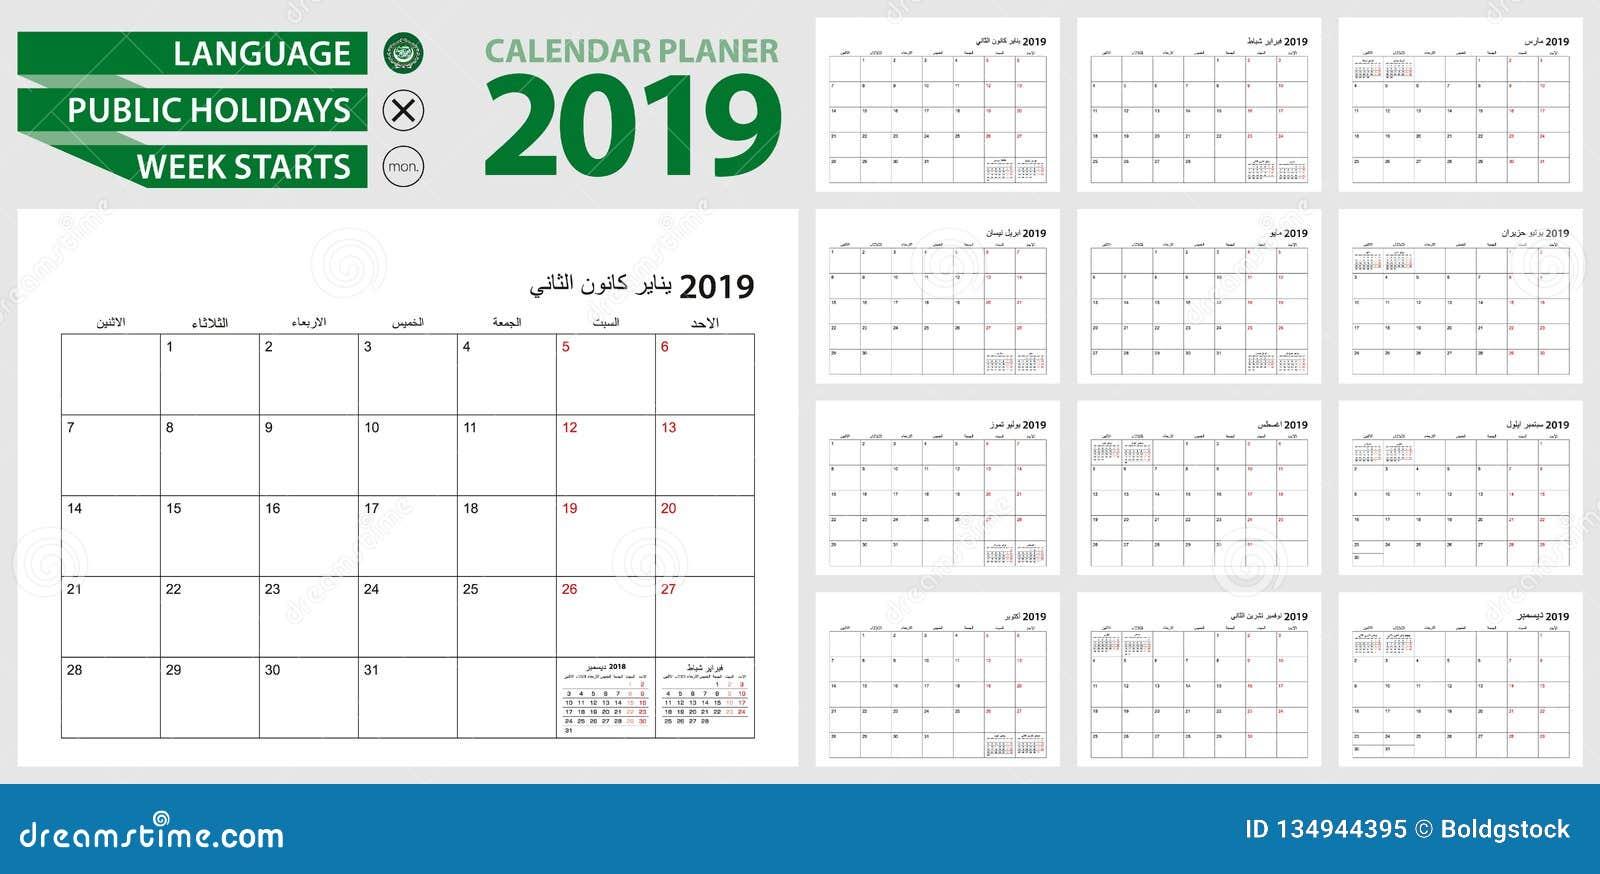 Arabic Calendar Planner For 2019  Arabic Language, Week